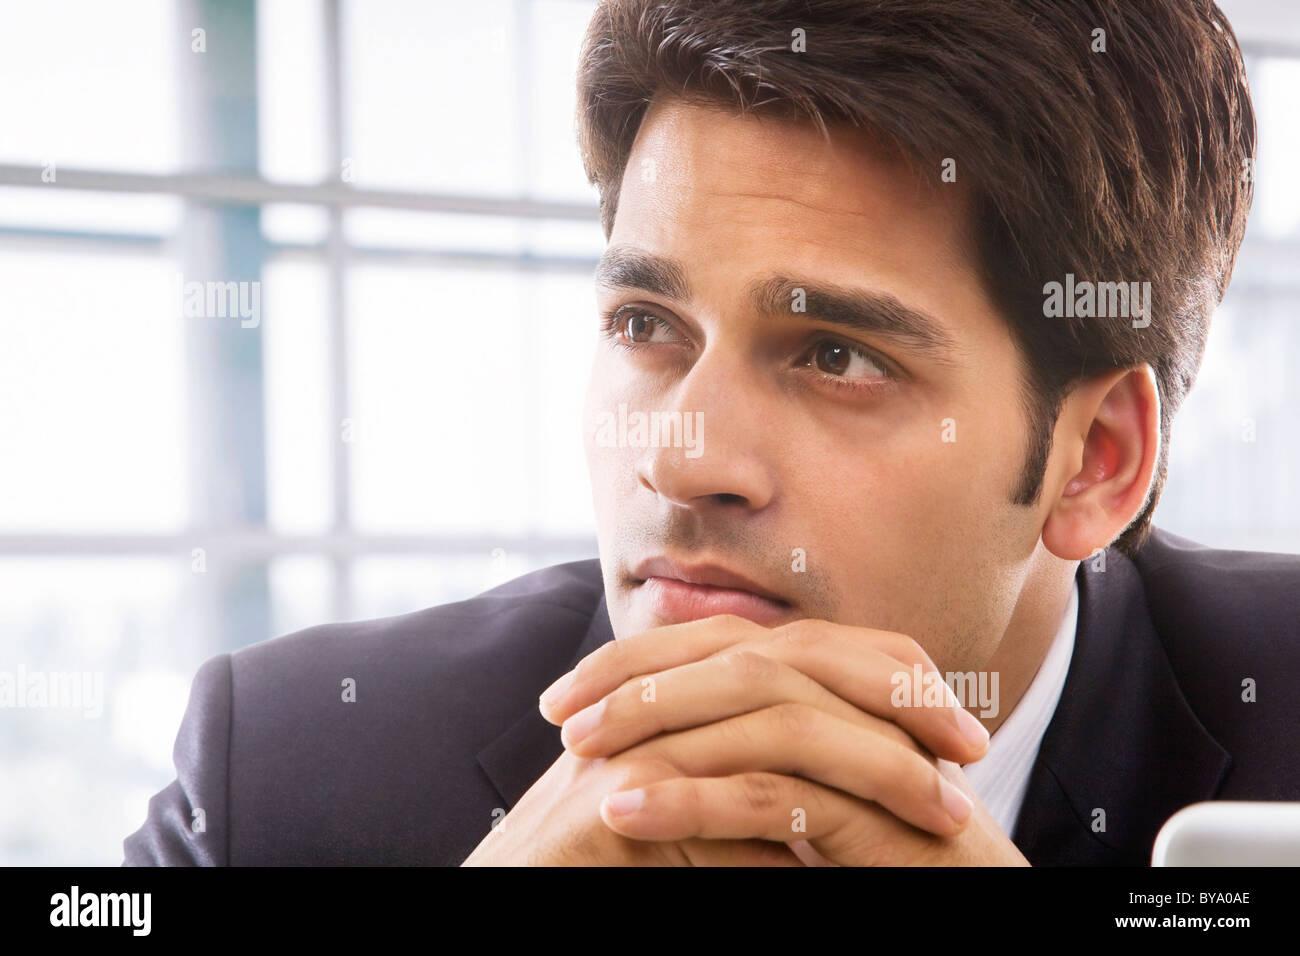 Businessman thinking Photo Stock